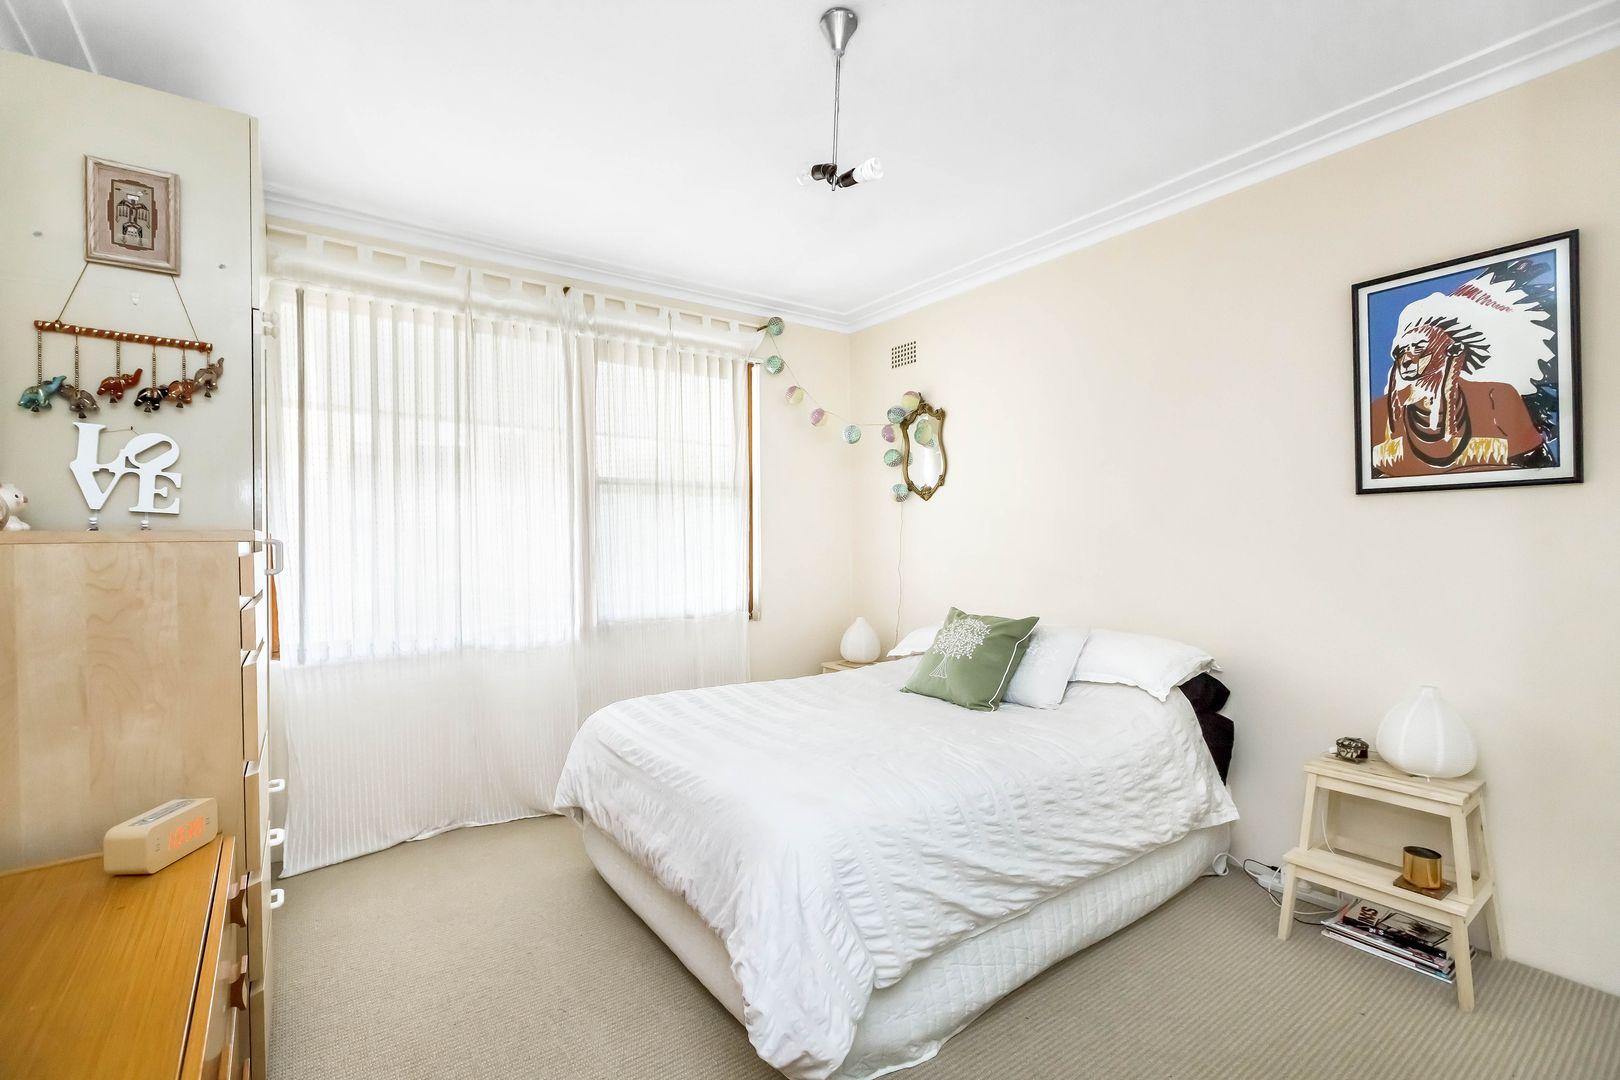 16/30 Tranmere  Street, Drummoyne NSW 2047, Image 2